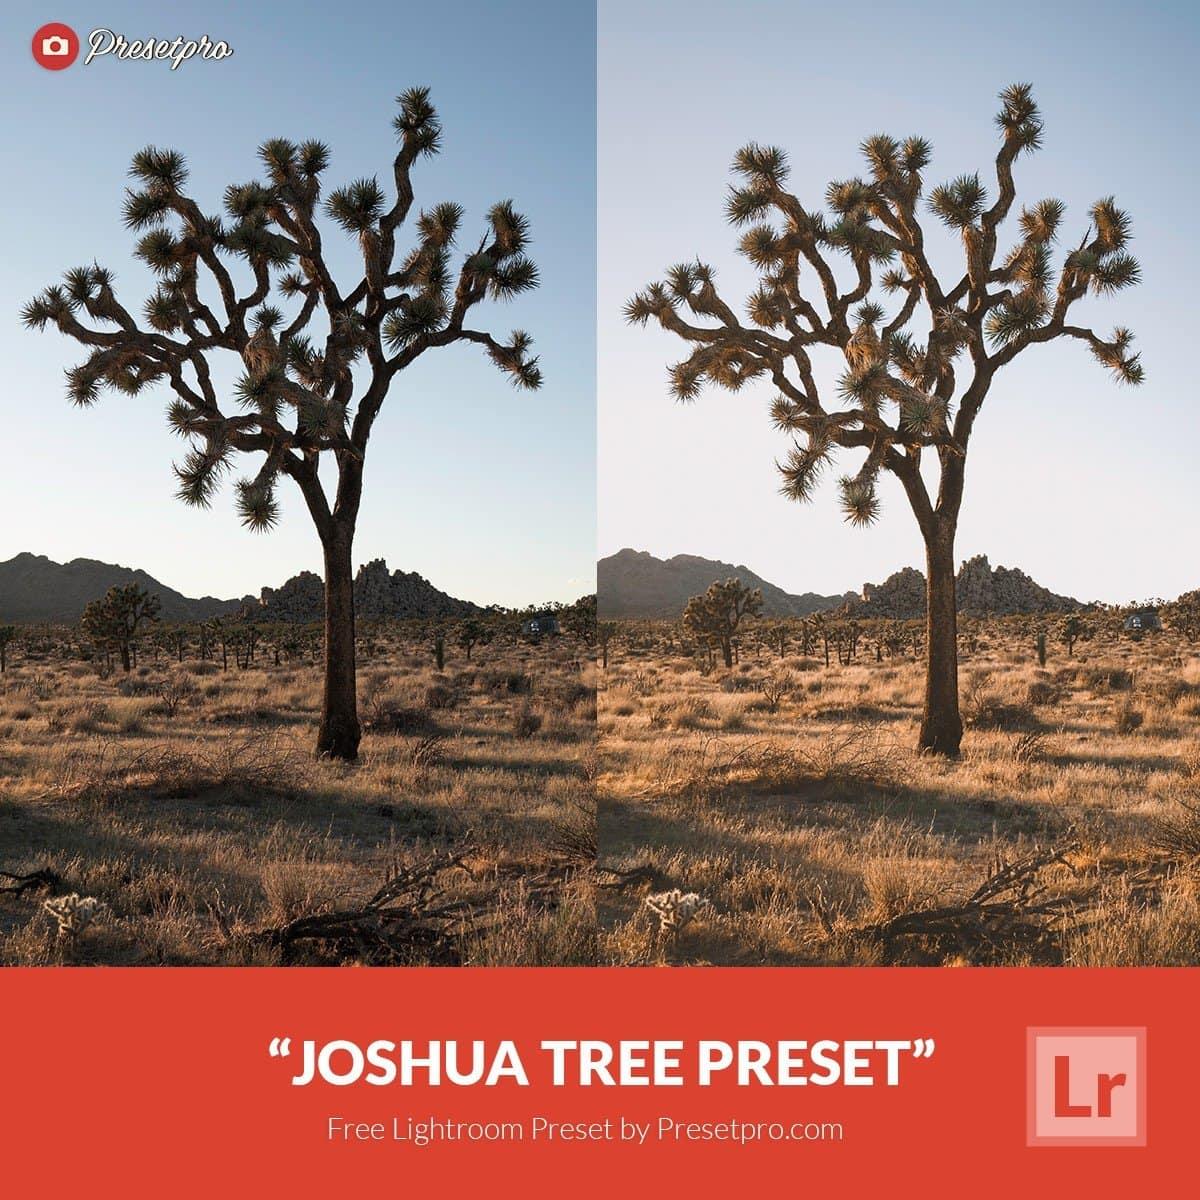 Free-Lightroom-Preset-Joshua-Tree-Presetpro.com